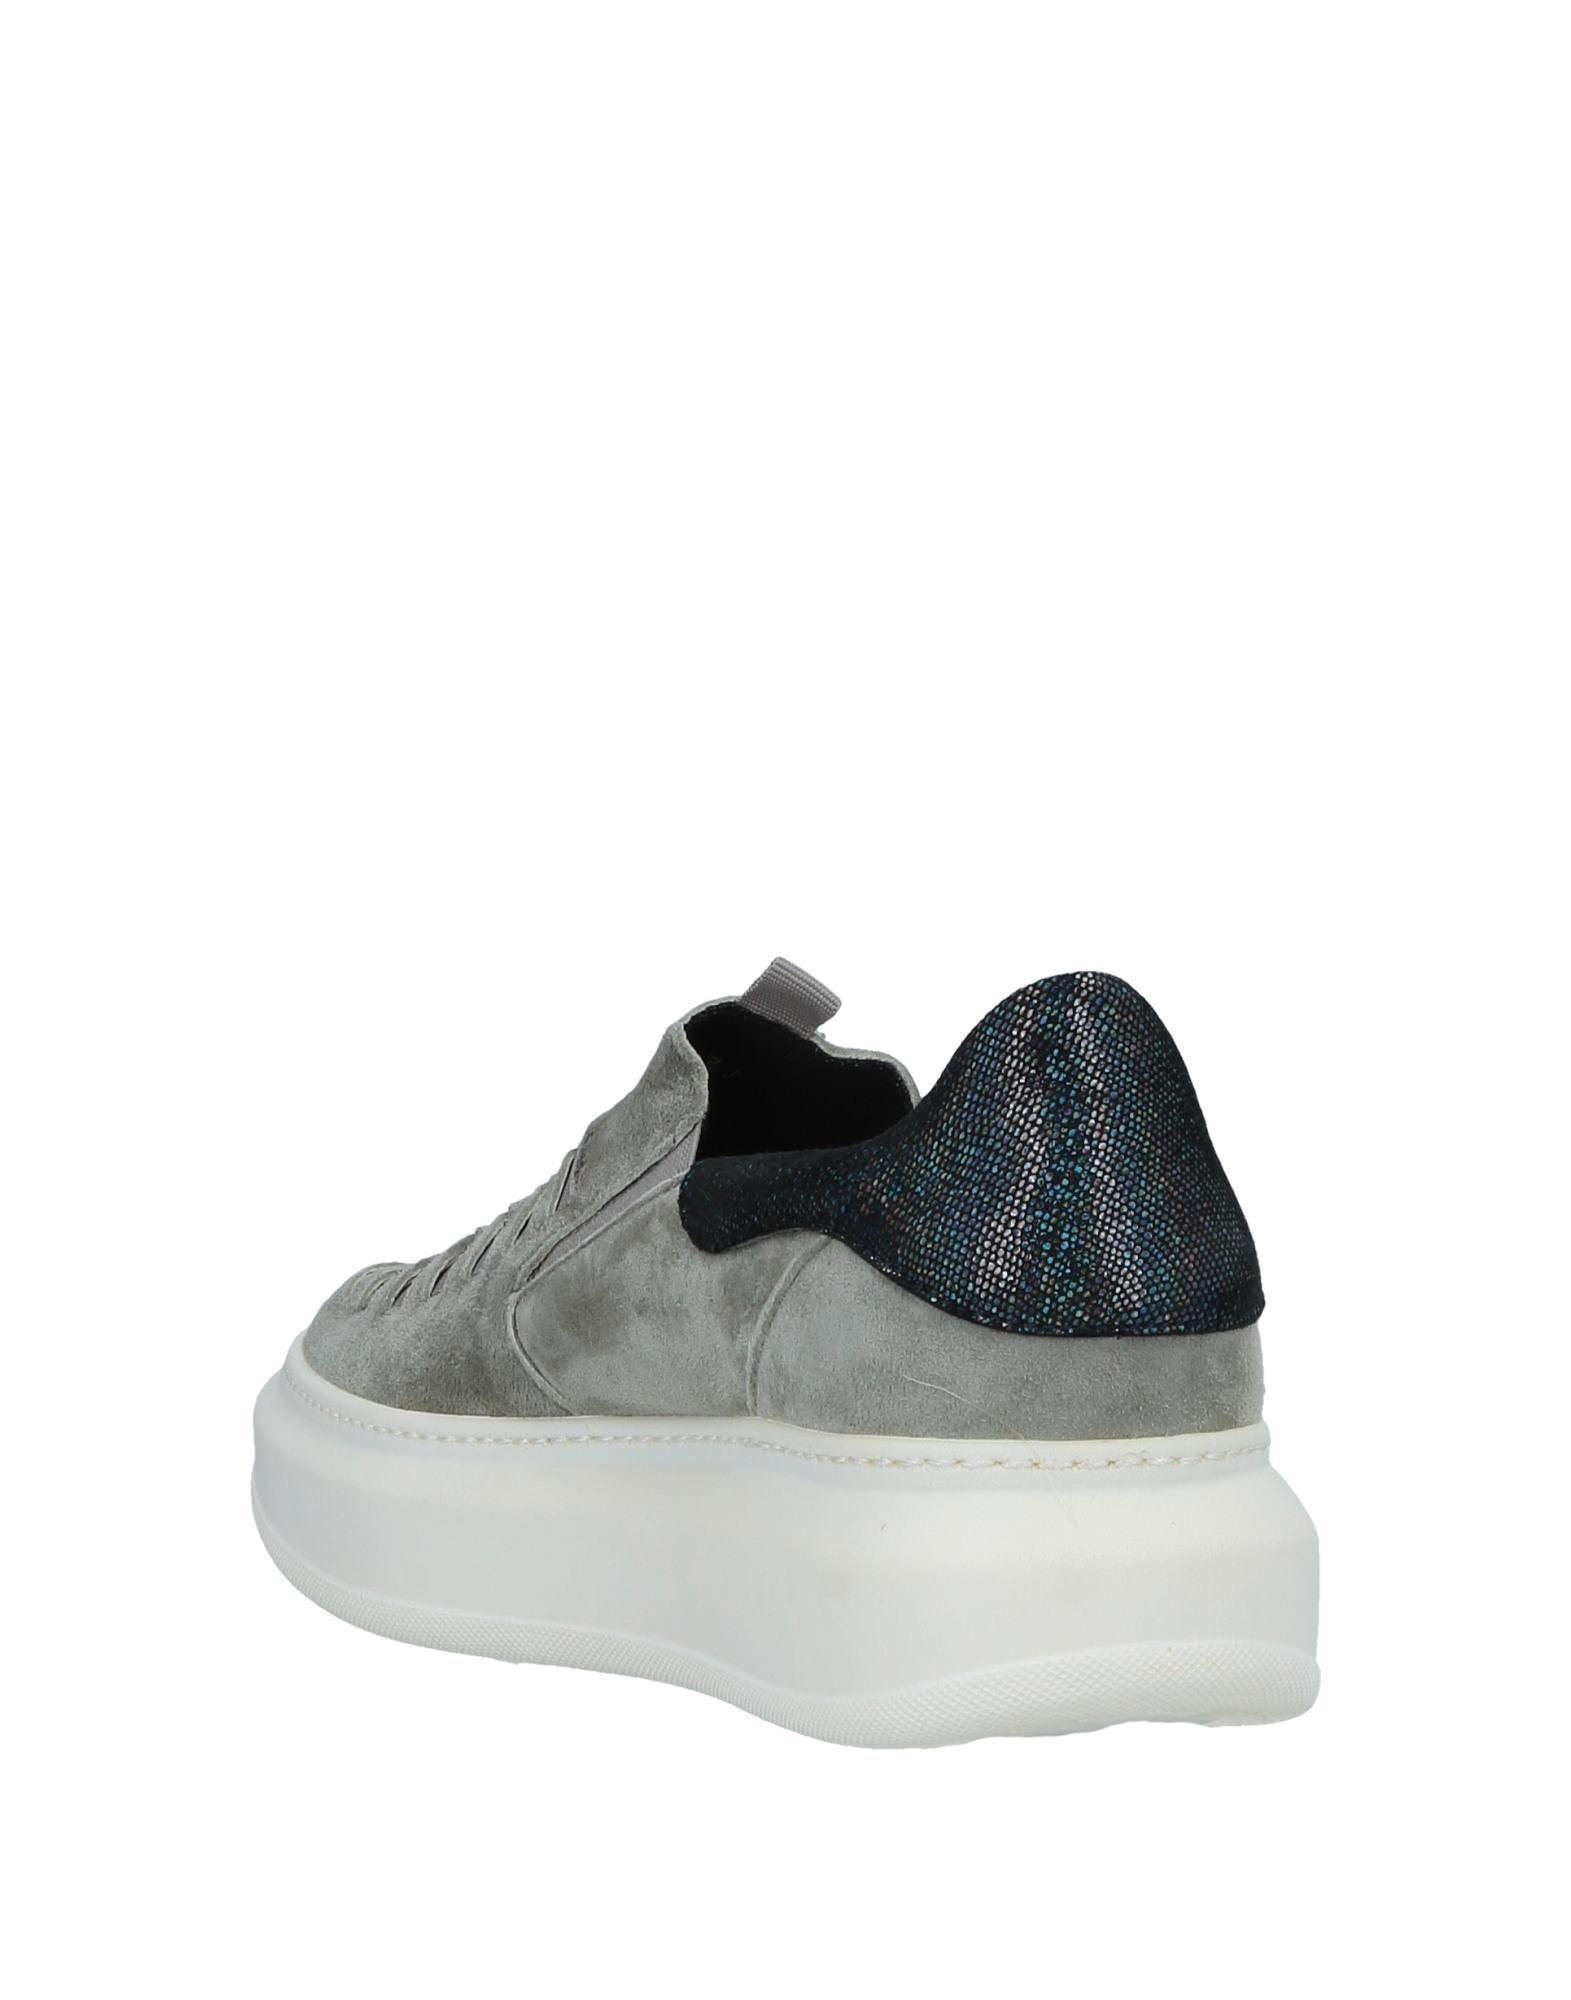 Gordon Sneakers Damen  11527394MU Schuhe Gute Qualität beliebte Schuhe 11527394MU 6ac7c9